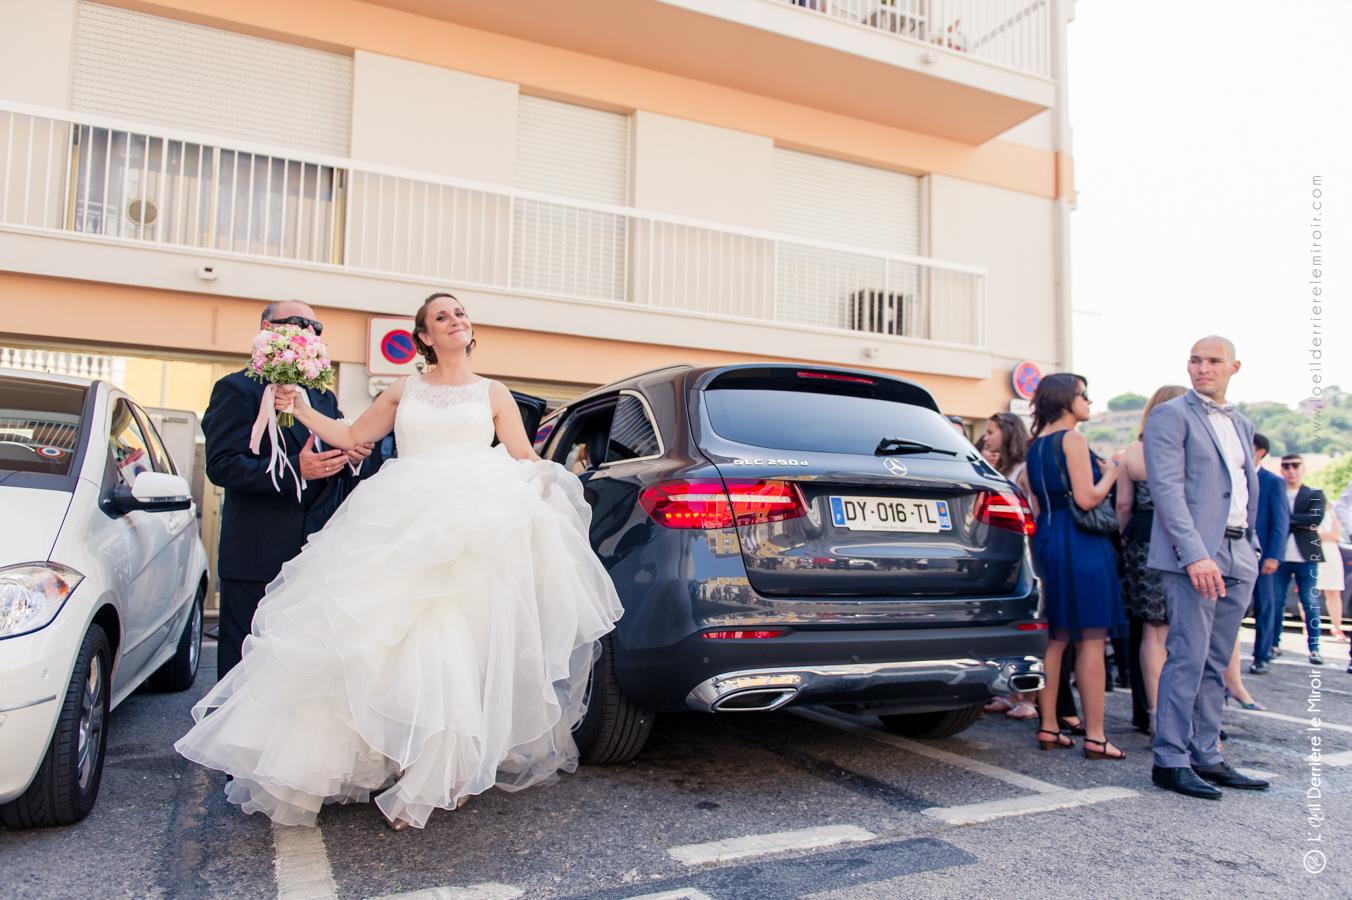 mariage-cj-vaugrenier-loeilderrierelemiroir-027